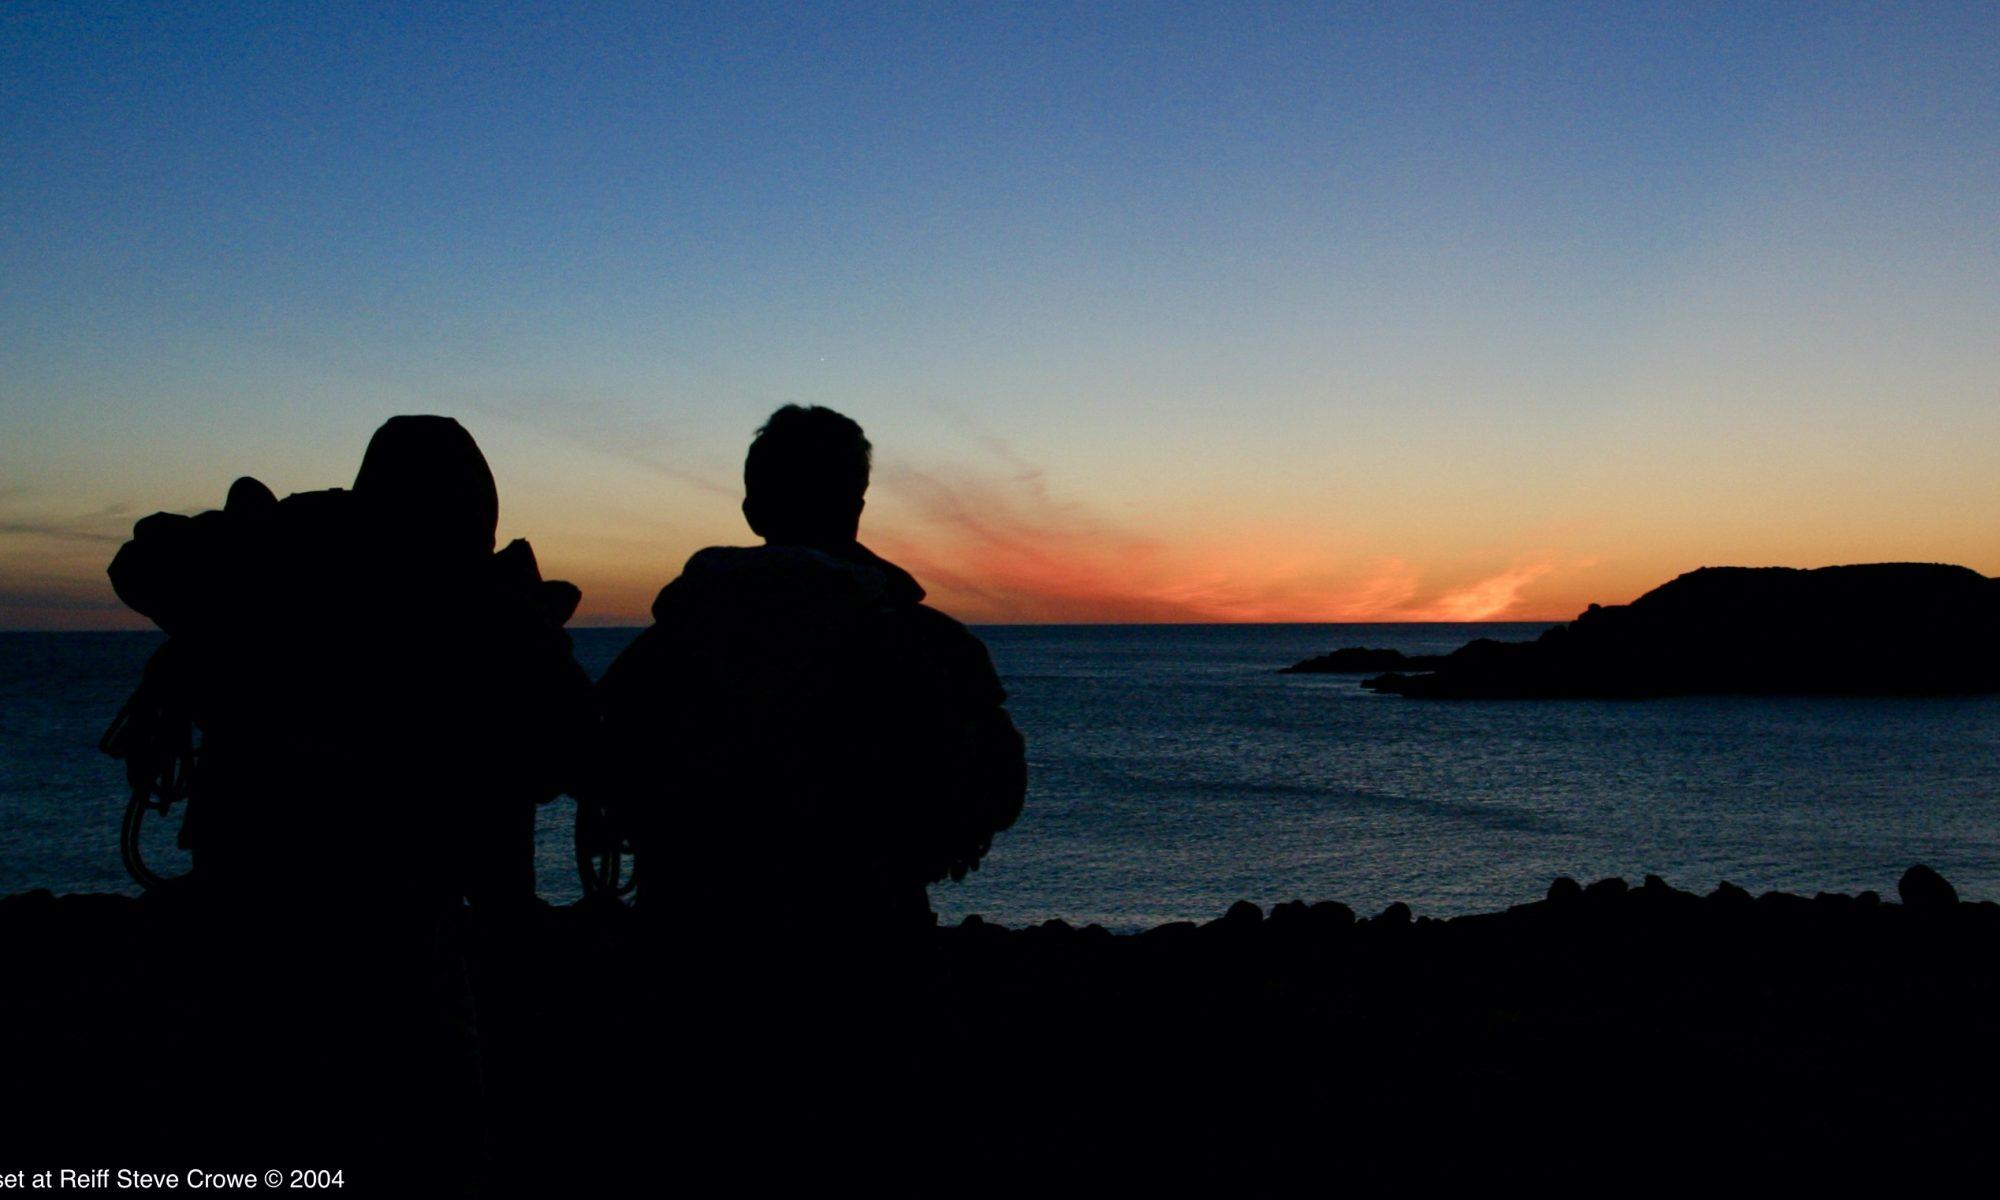 Sunset at Reiff © Steve Crowe 2004